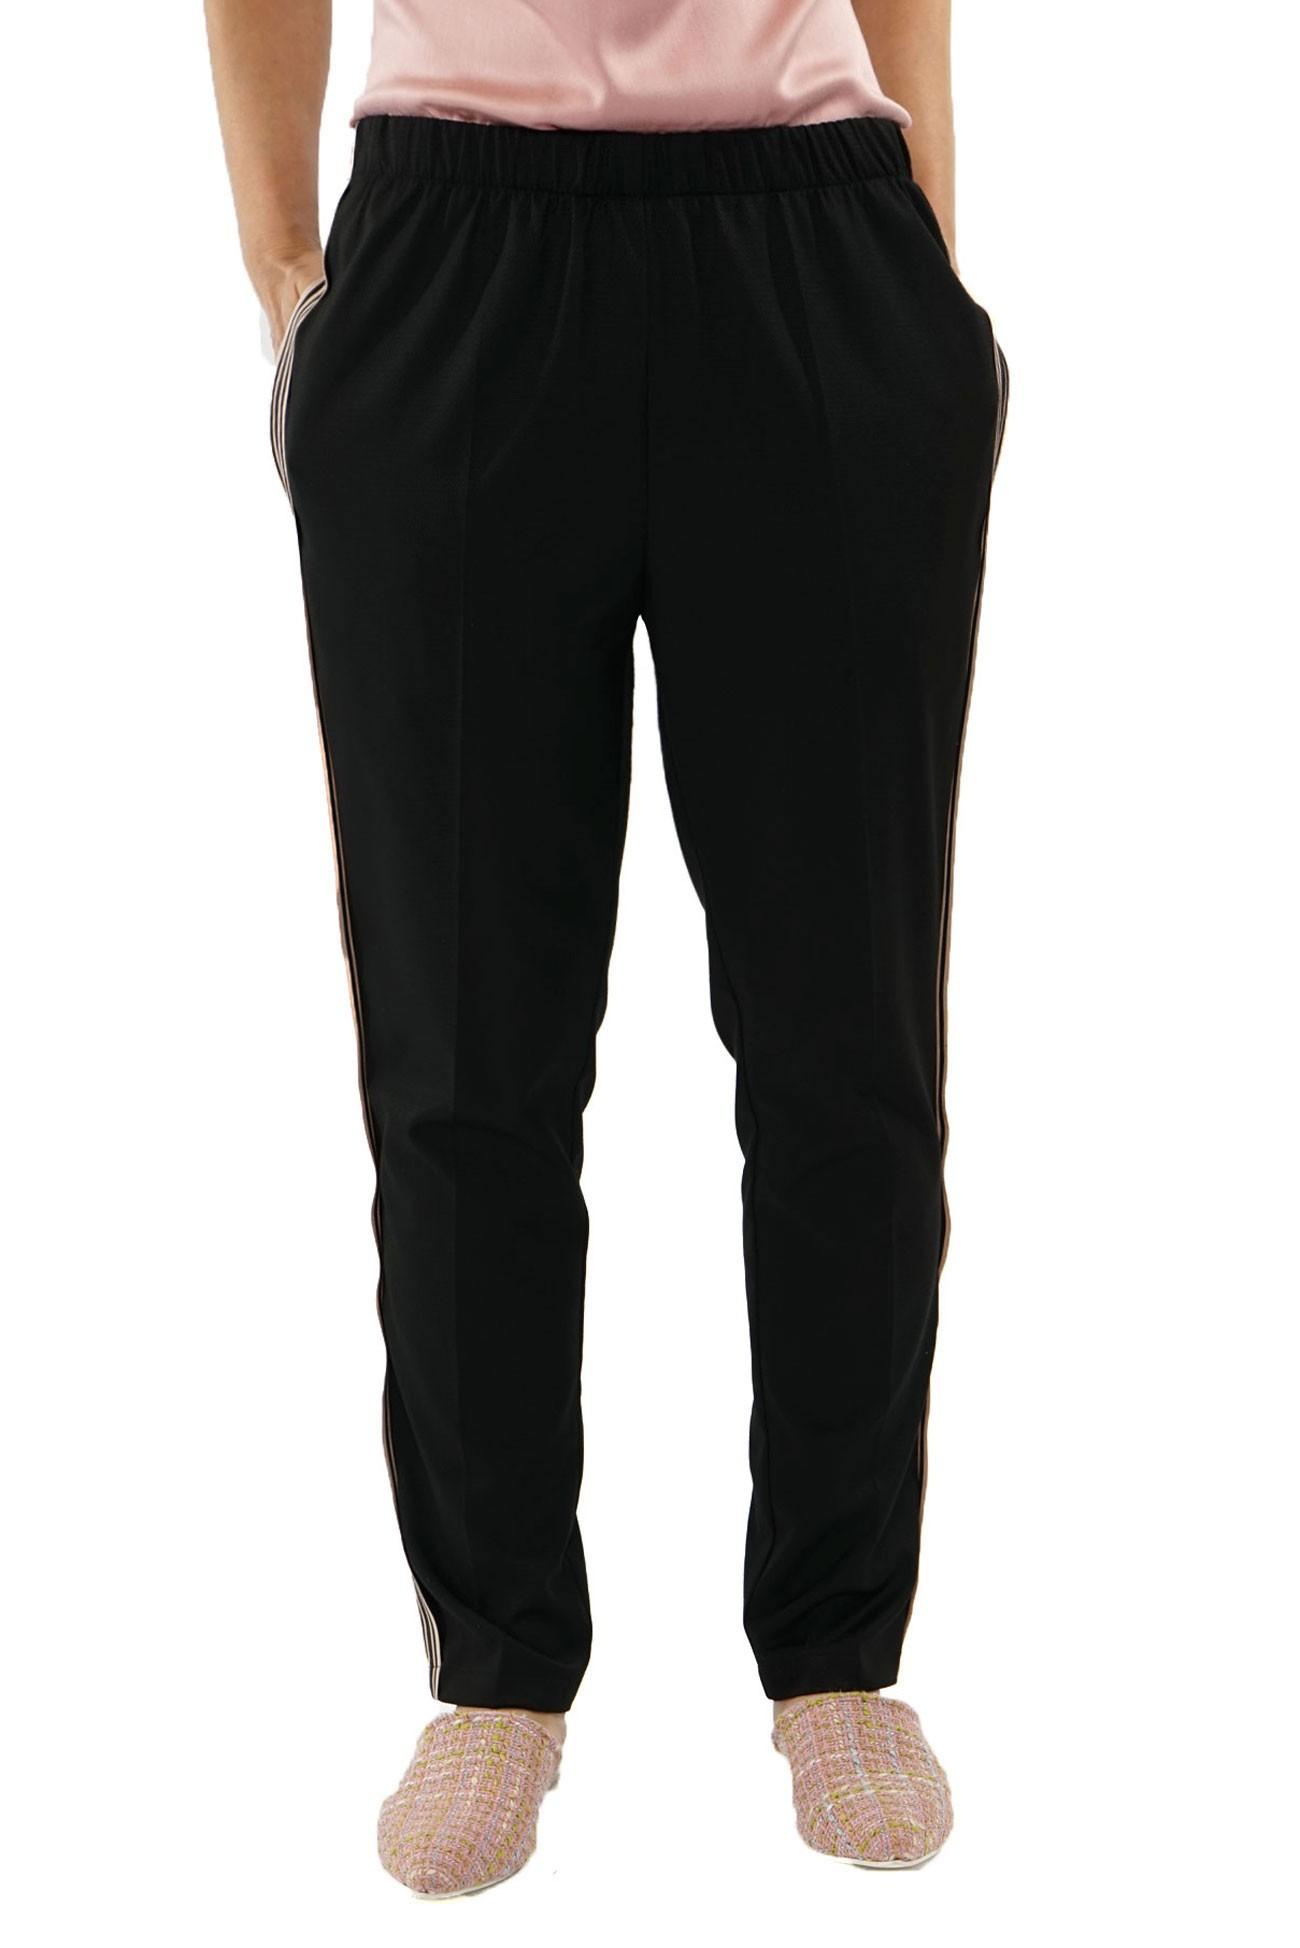 Pantalon cu dungi pe lateral